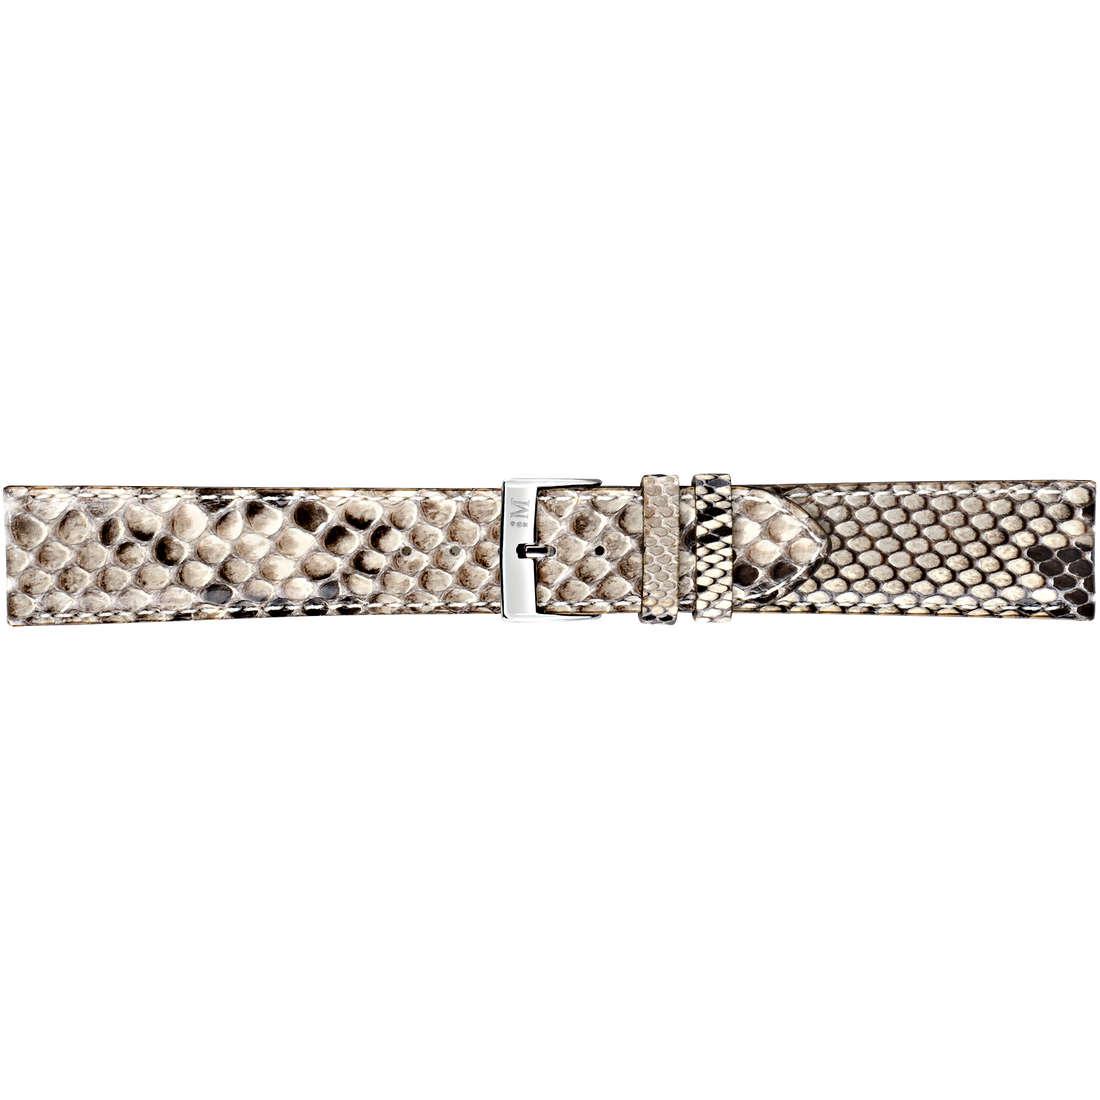 watch watch bands watch straps man Morellato Pelli Preziose A01X1458474024CR18